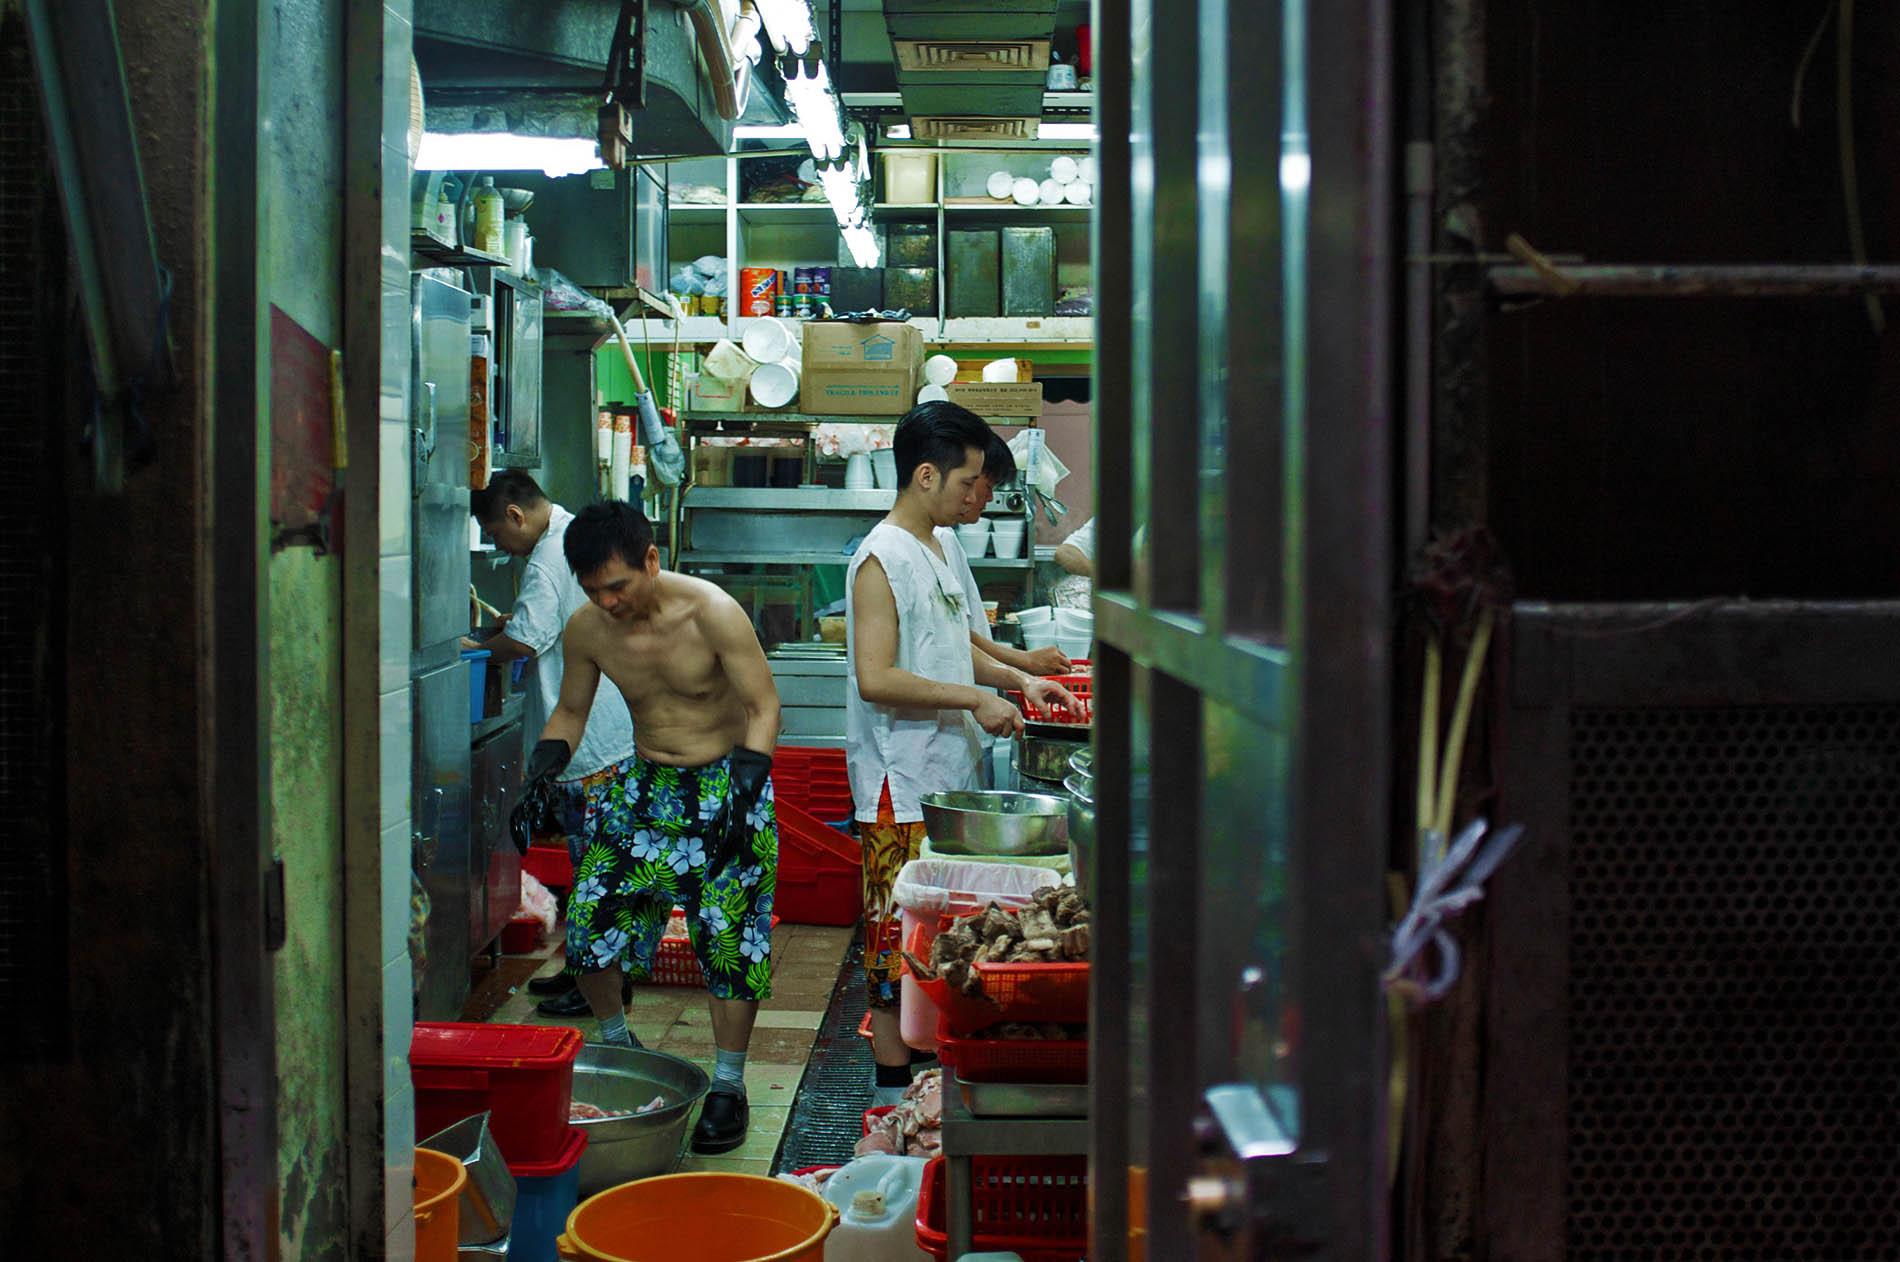 Restaurant employees.